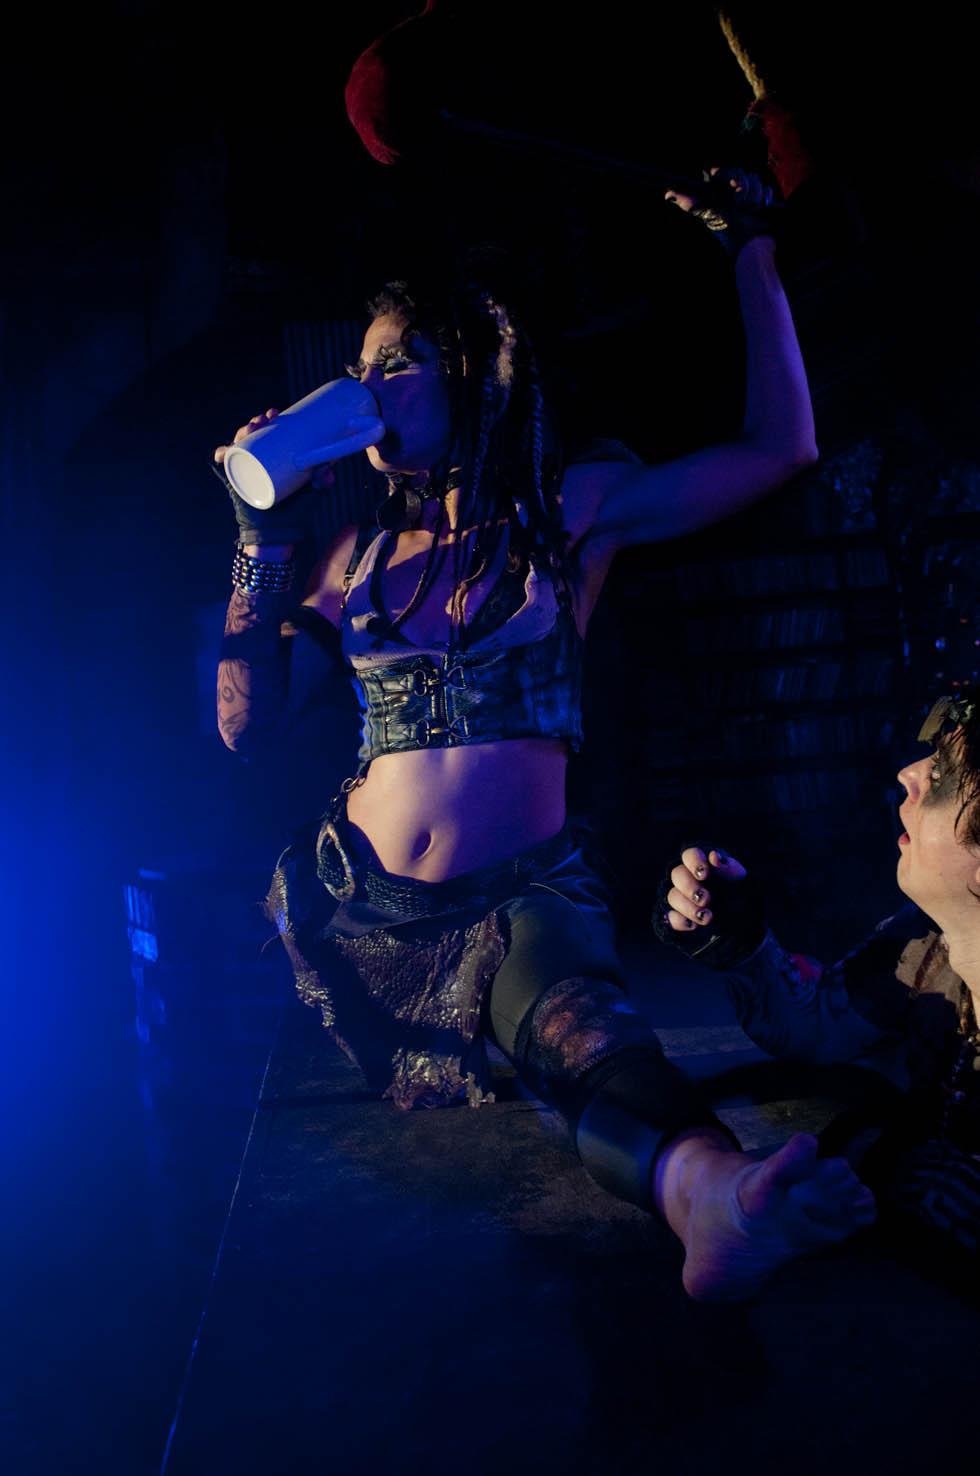 zum-schneider-nyc-2012-karneval-apocalyptika-5211.jpg